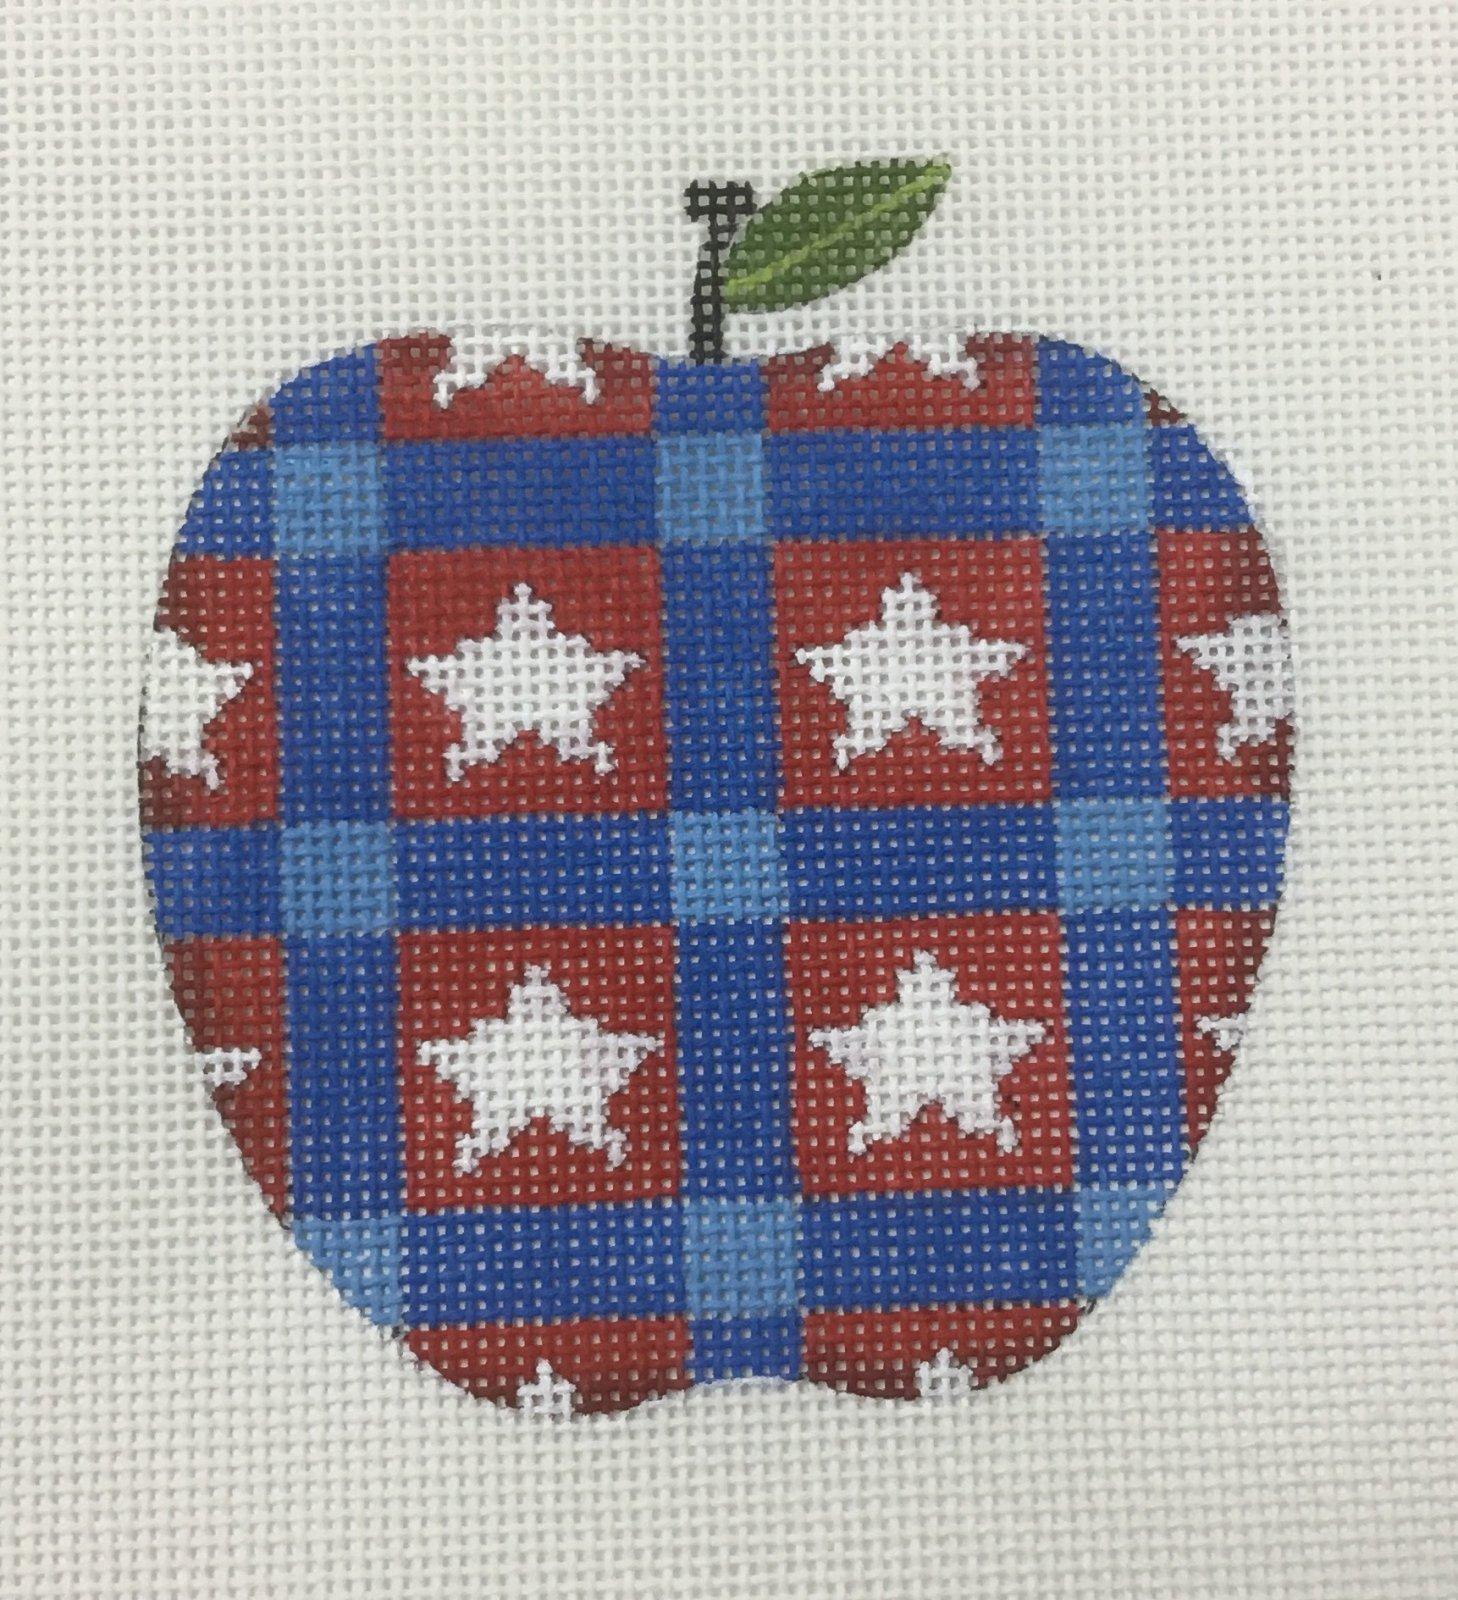 Apple w/ Star Design, 18ct., 3.5 x 3.5